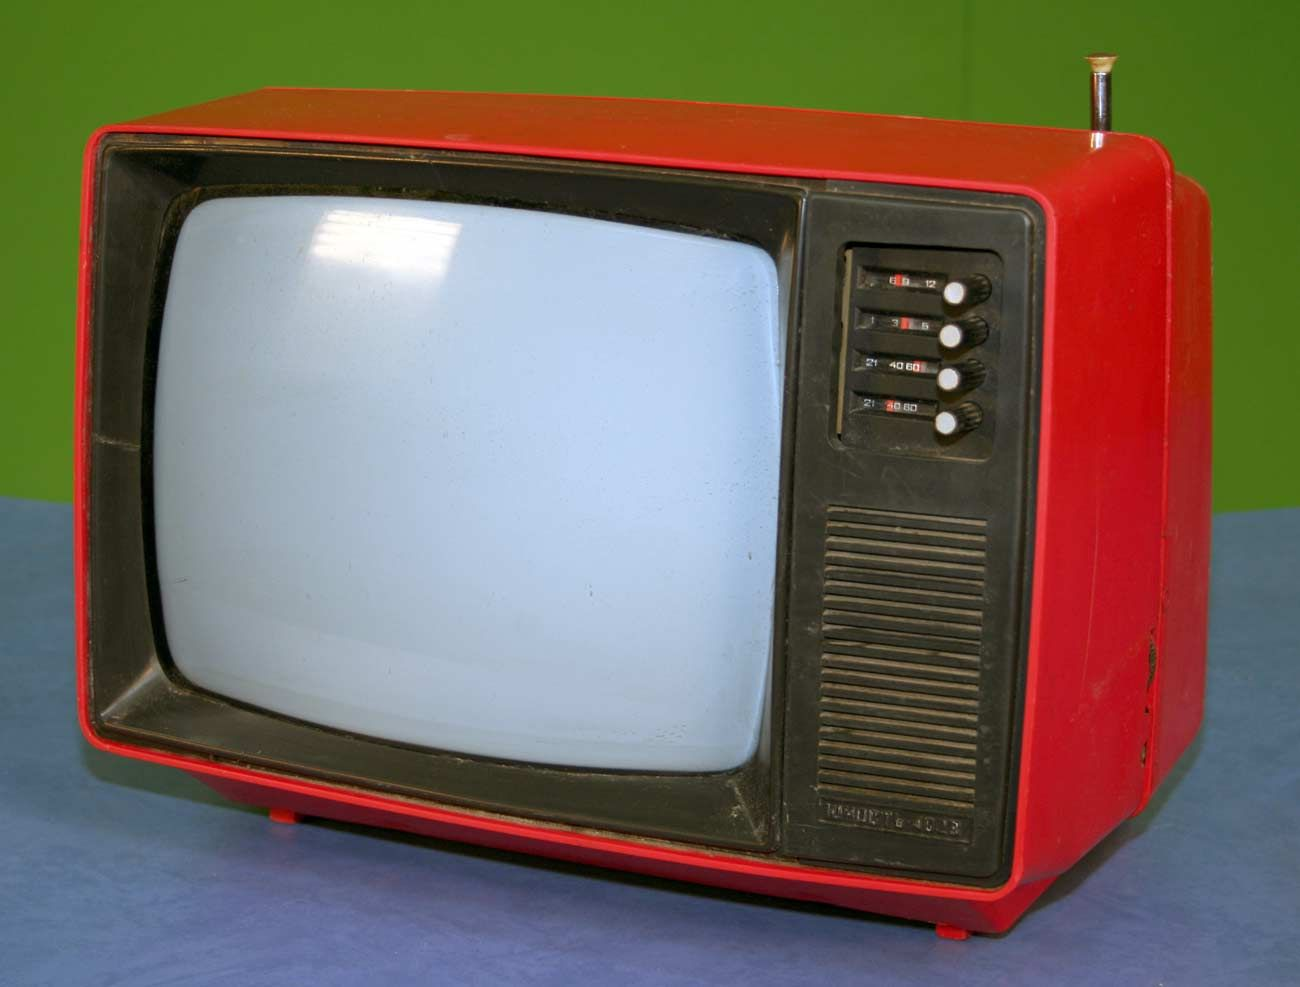 Junost TV